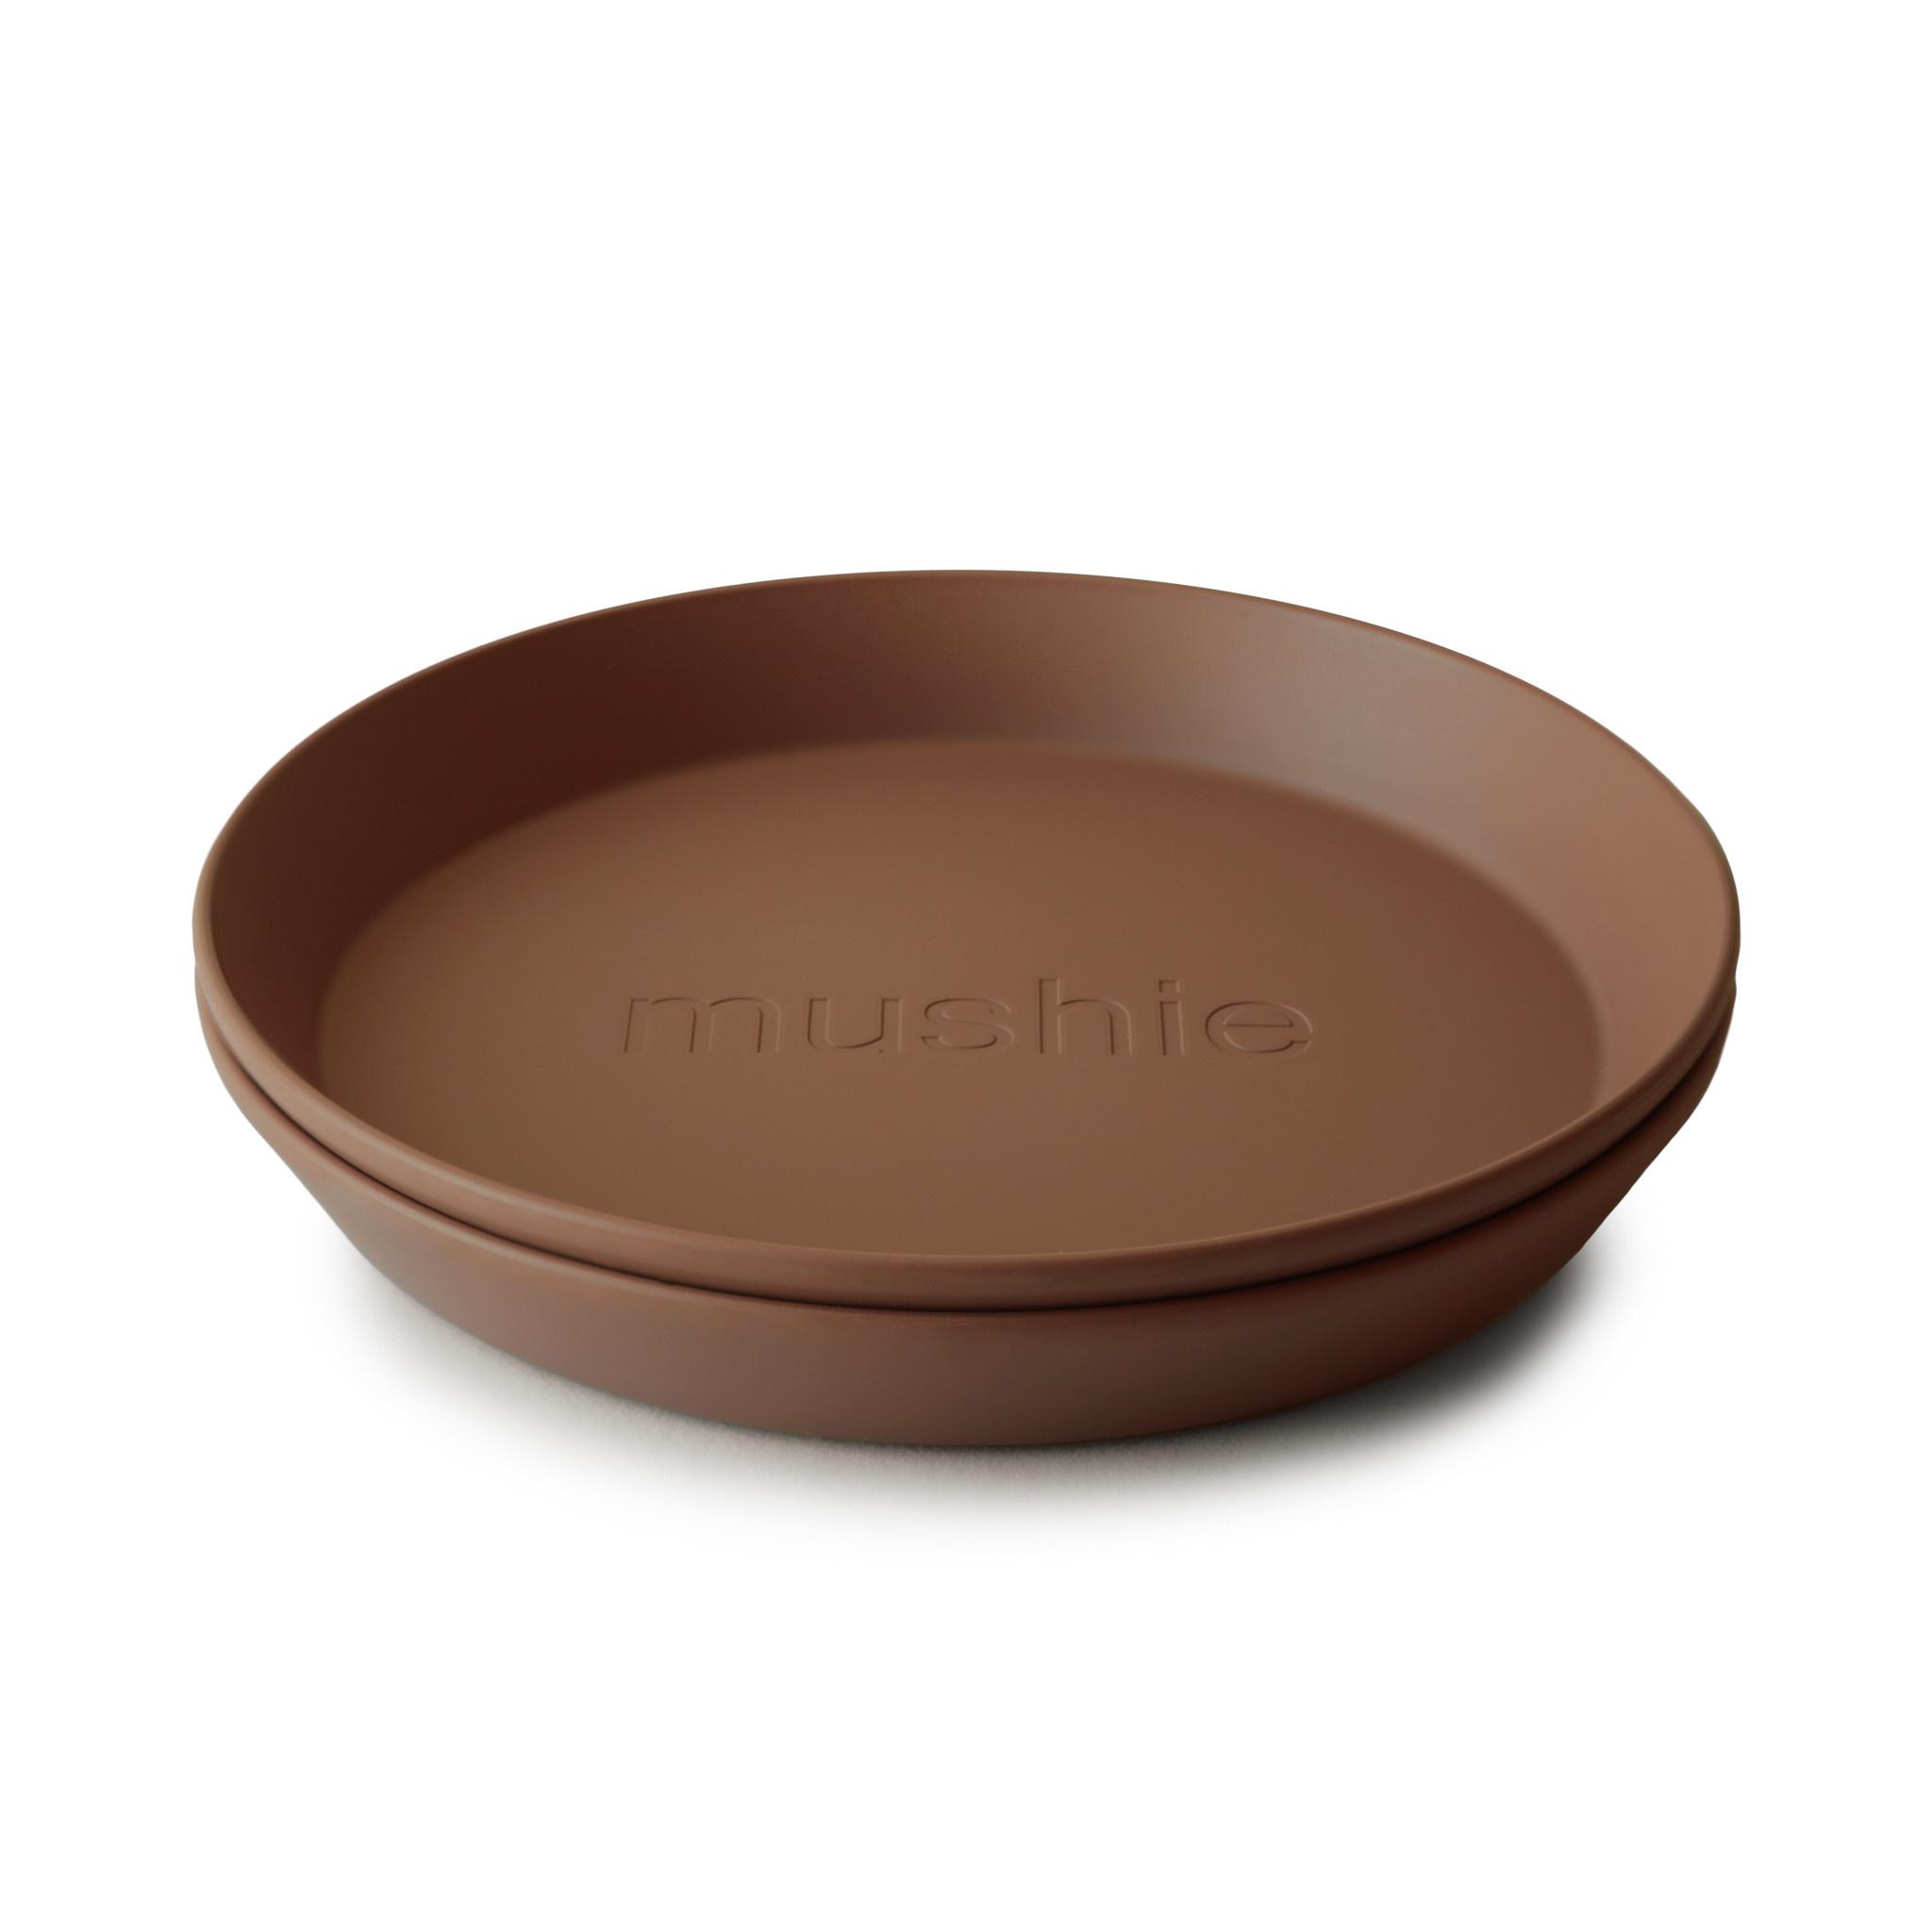 Plates round 2 pack caramel-1